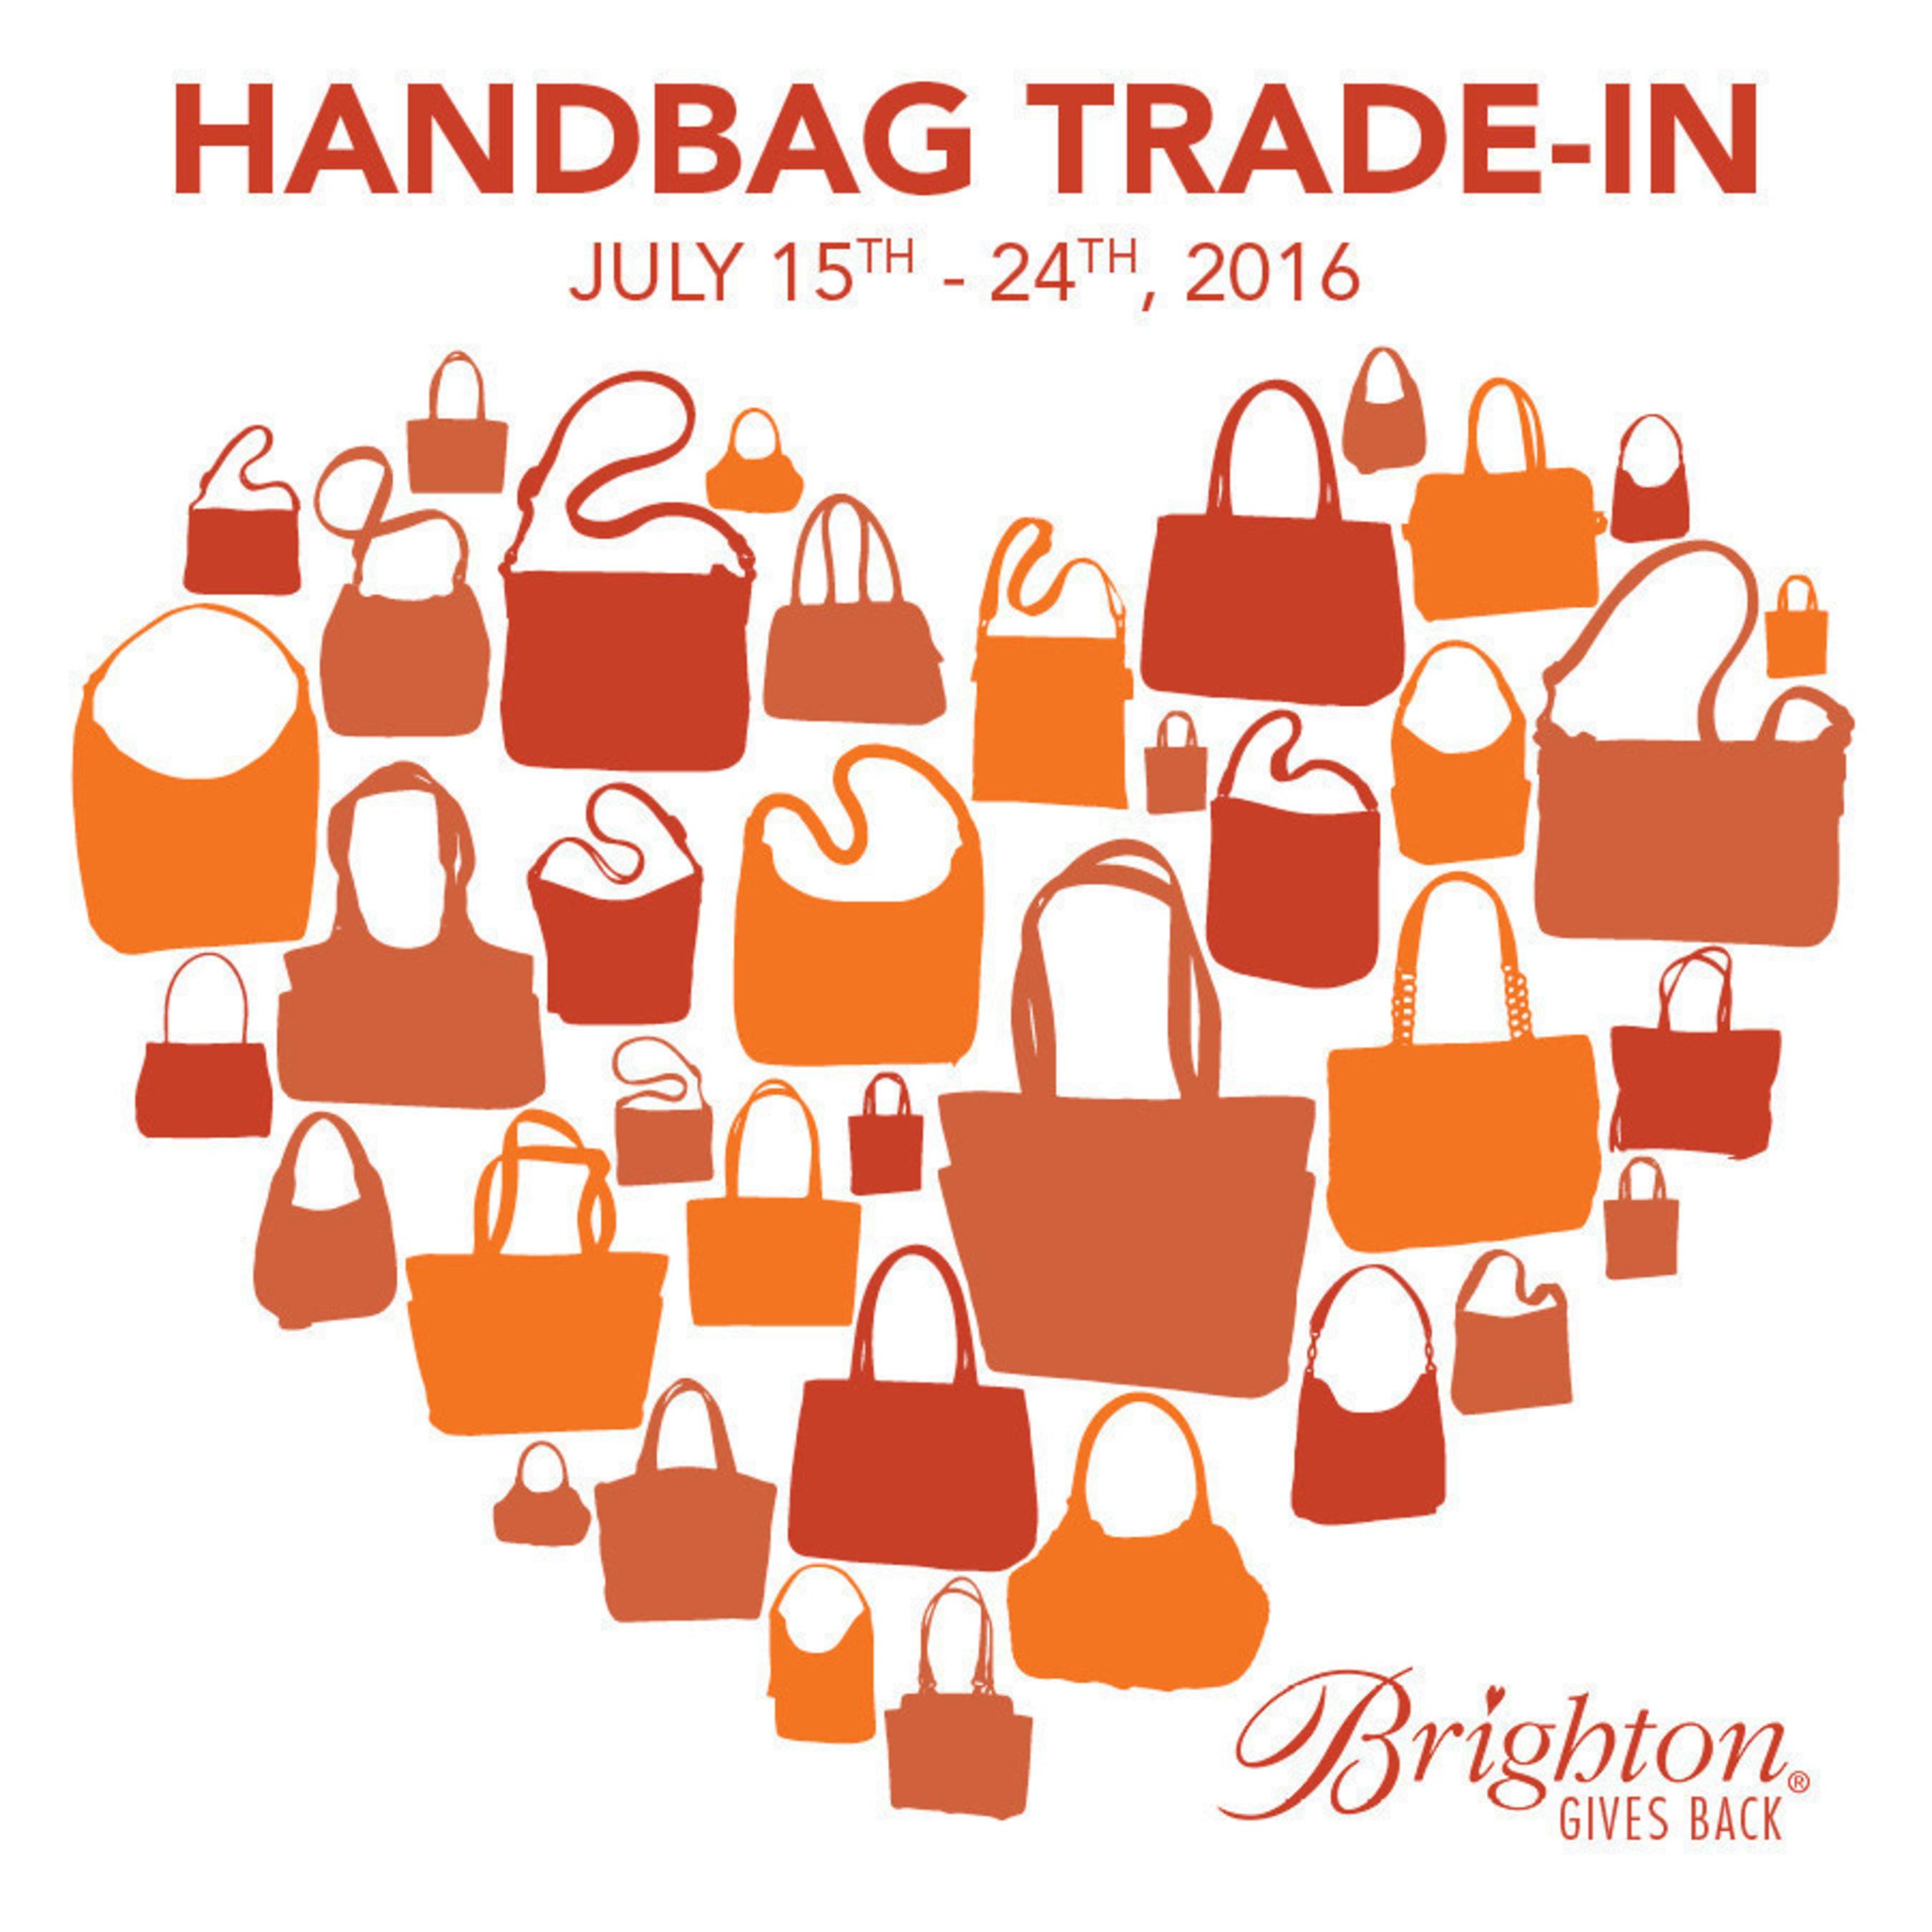 Brighton Handbag Trade-In